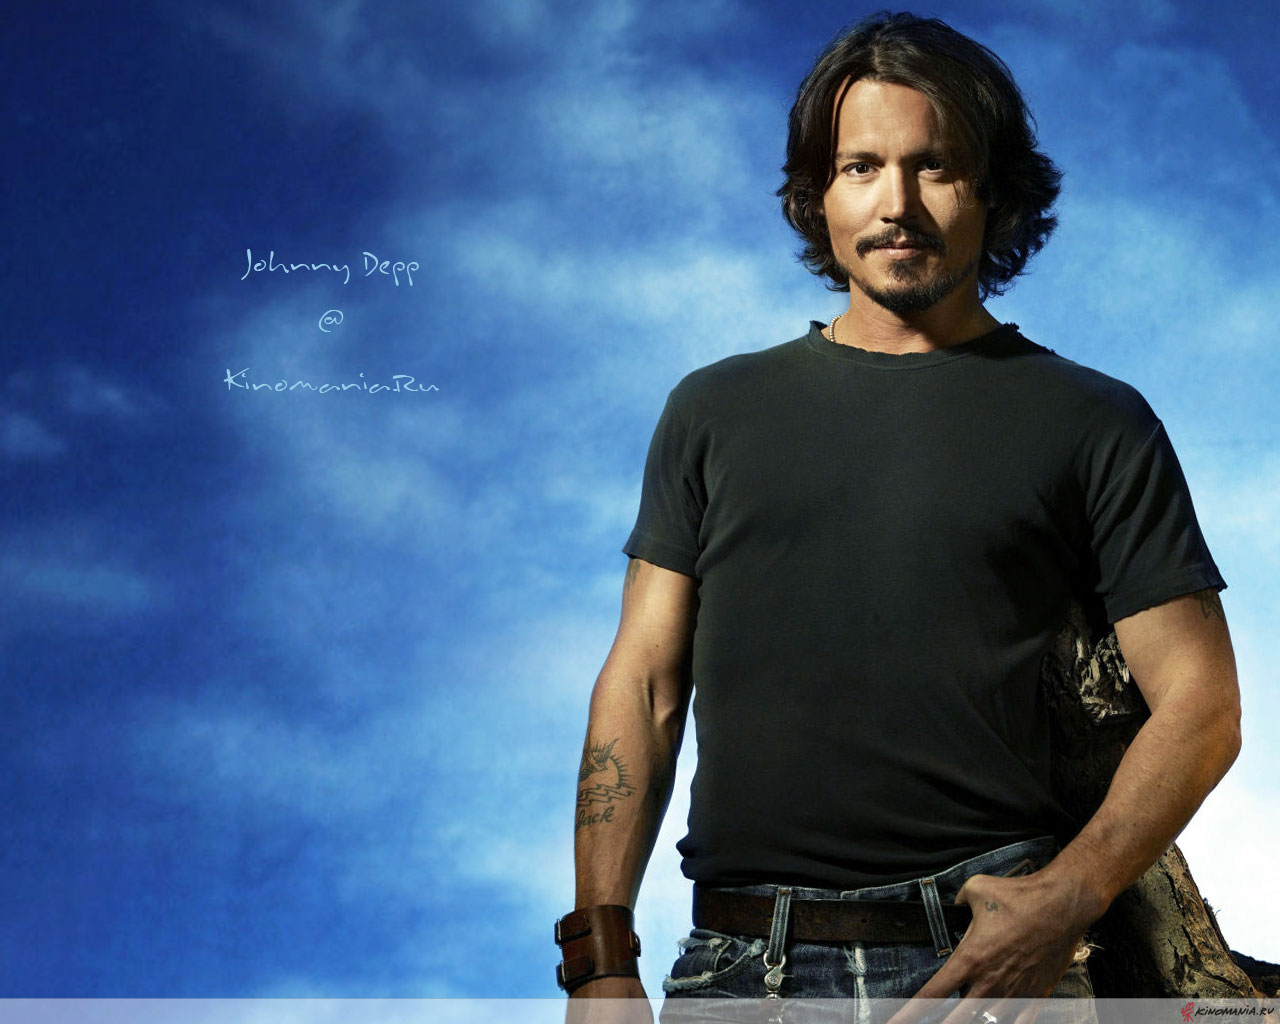 JD wallpapers   Johnny Depp Wallpaper 35510151 1280x1024